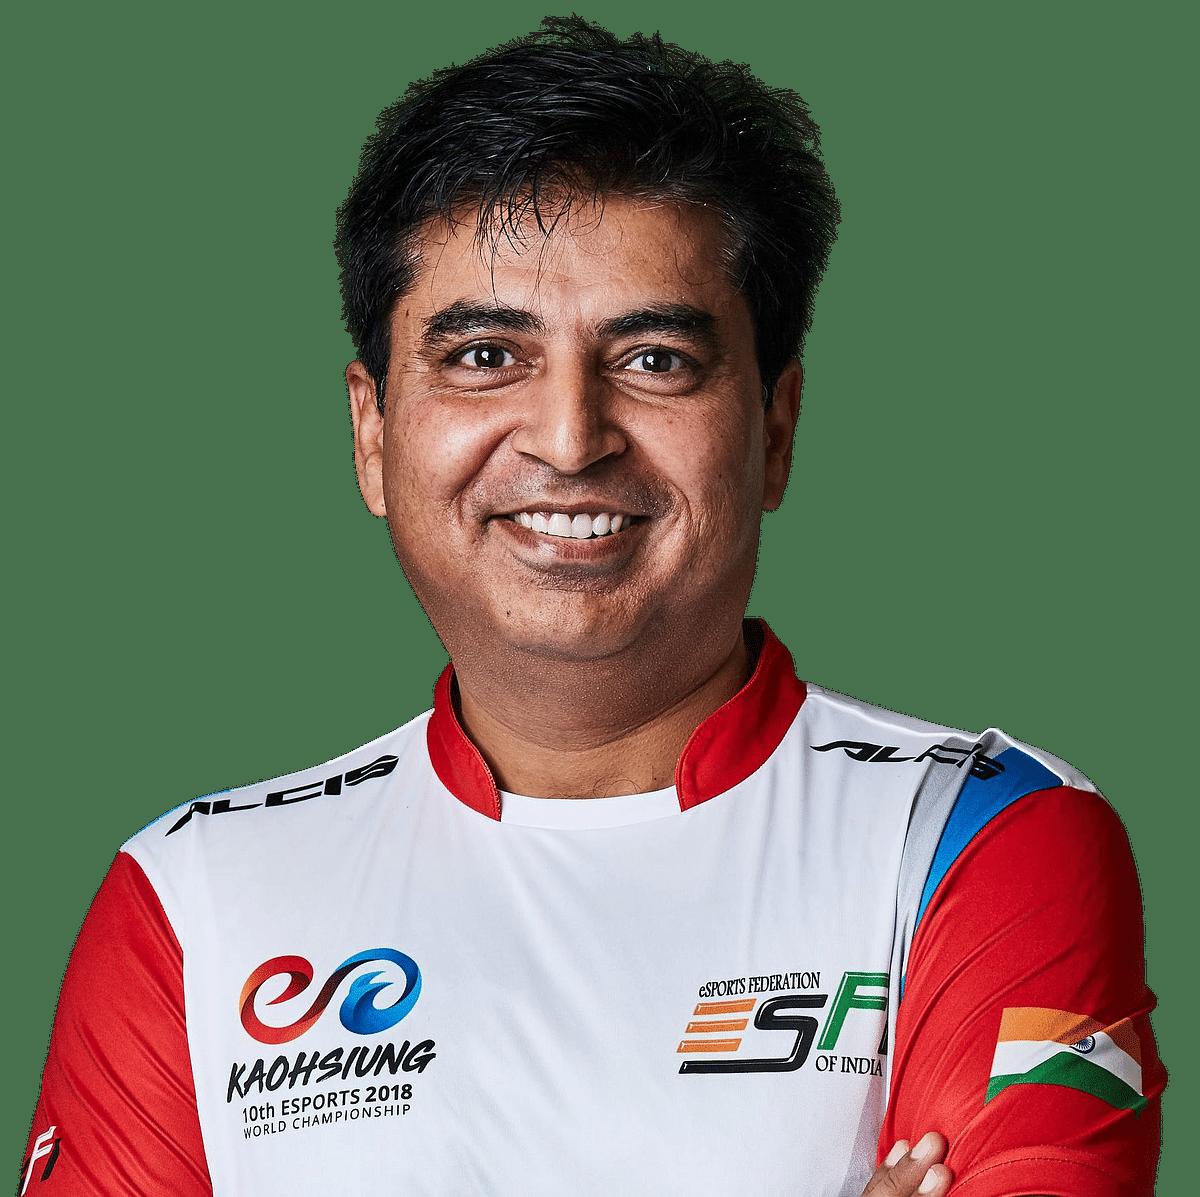 Lokesh Suji, Director, Esports Federation of India